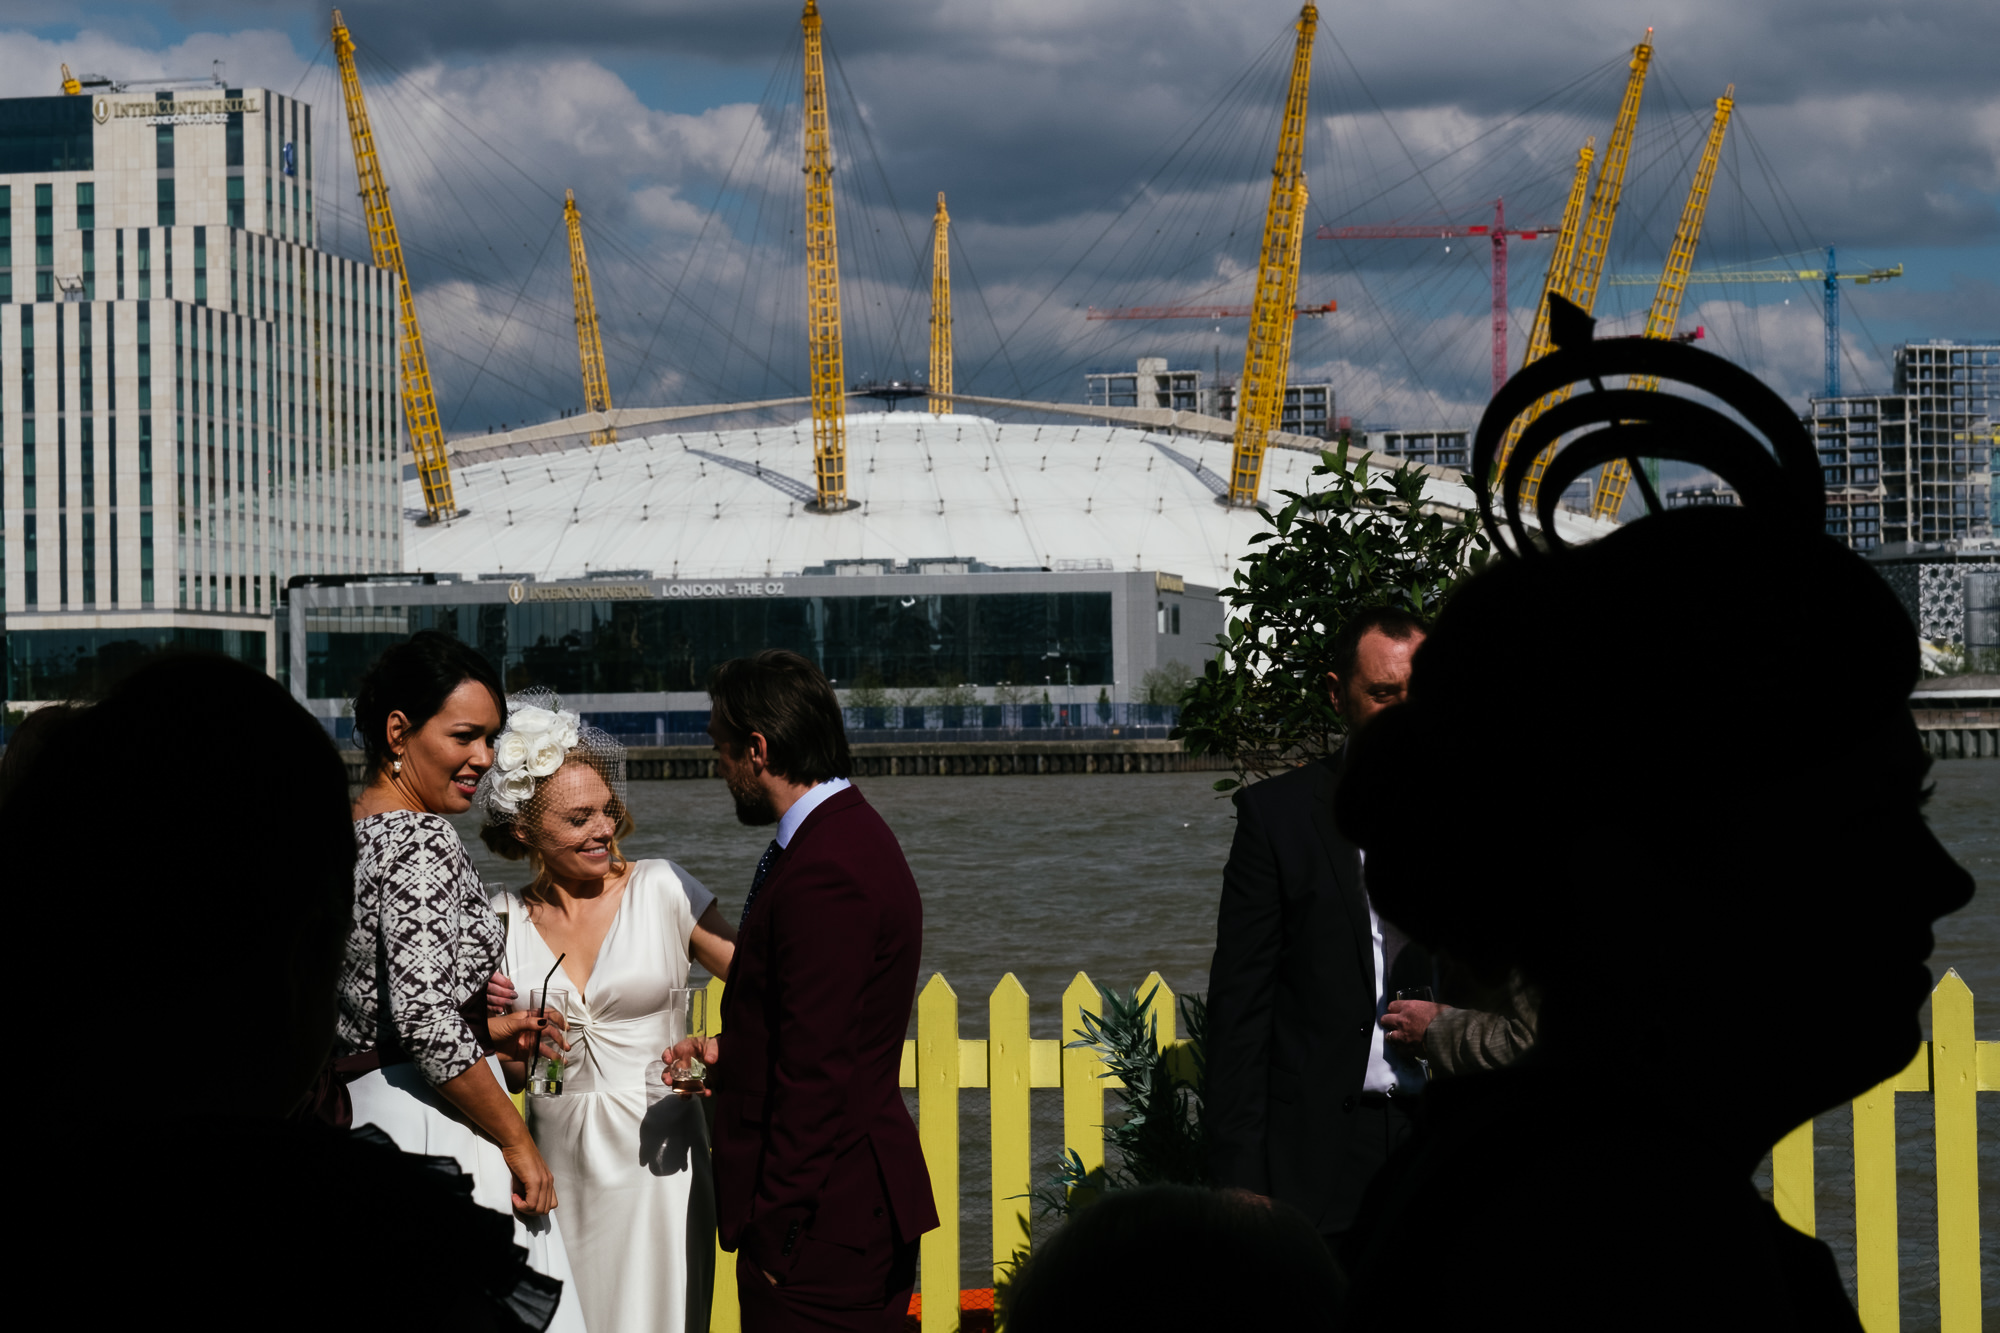 The Gun pub wedding